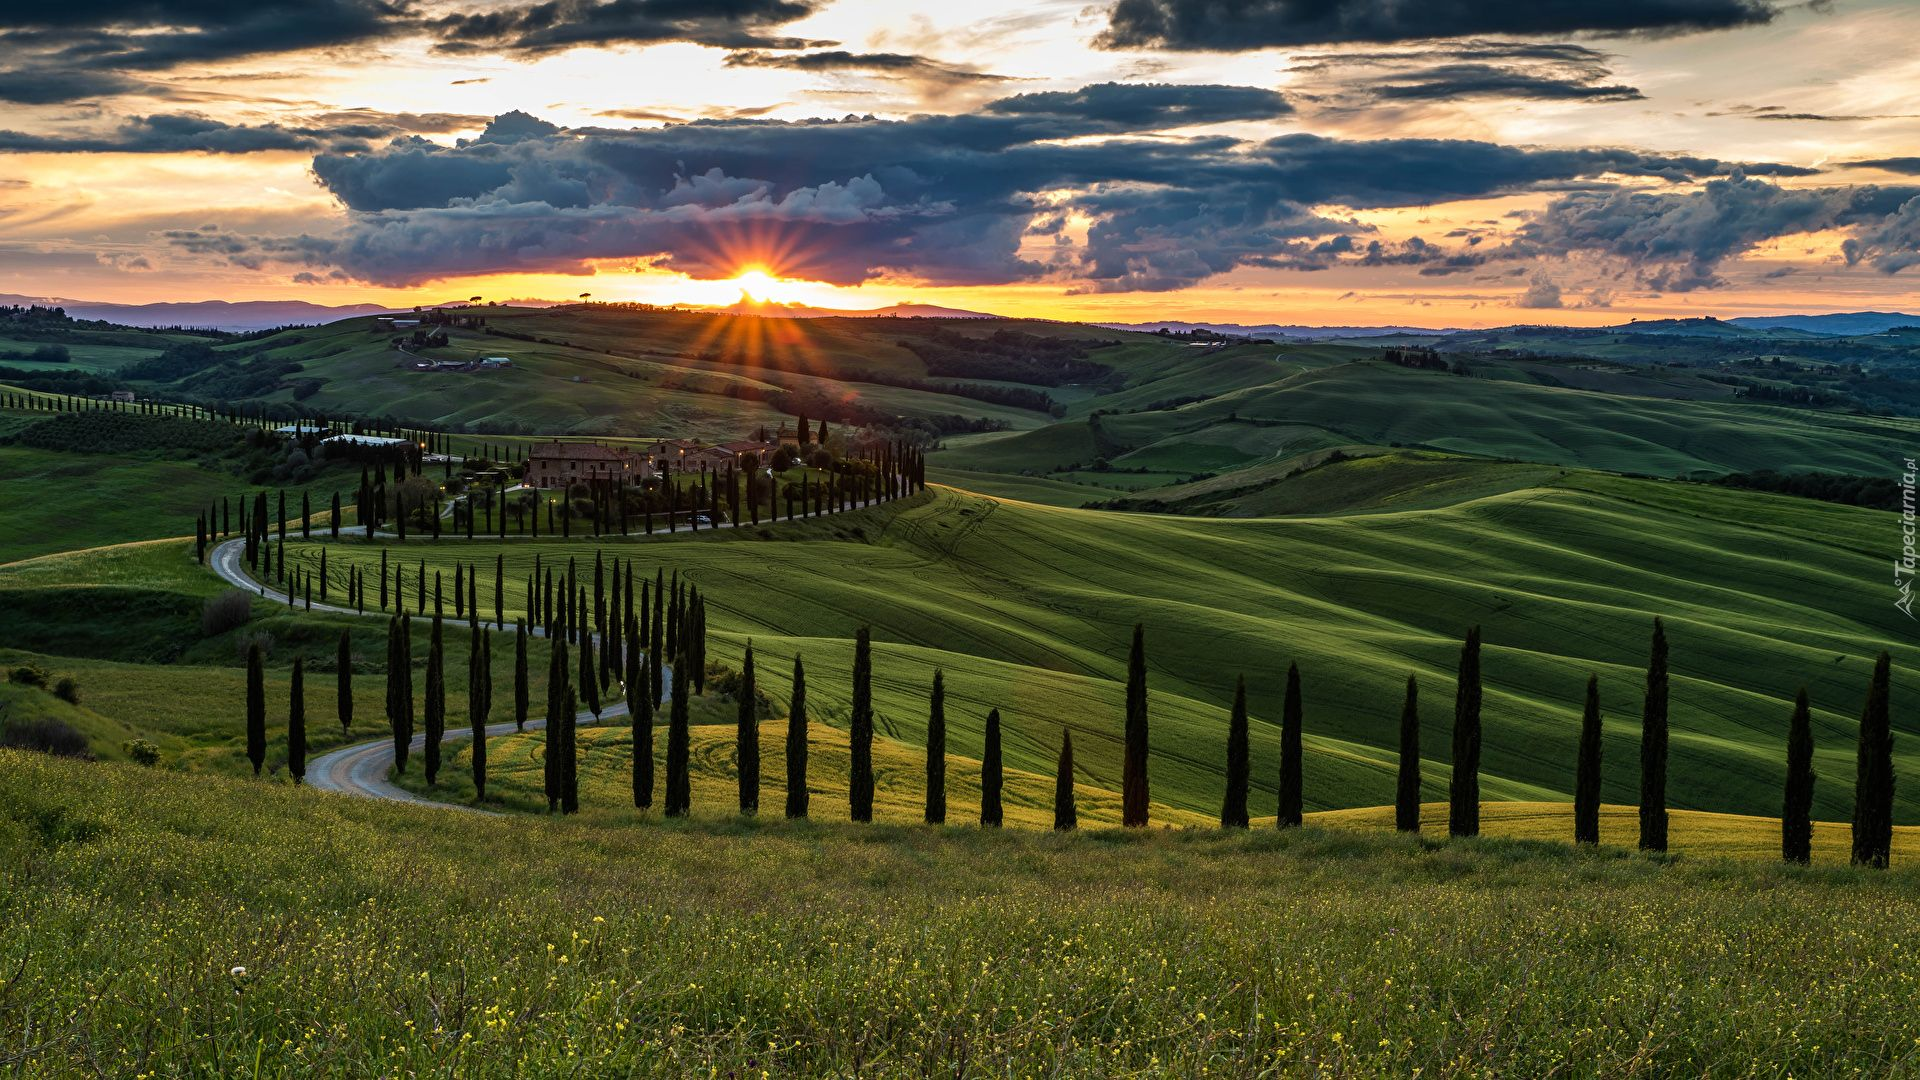 The Landscapes Of Tuscany Photo